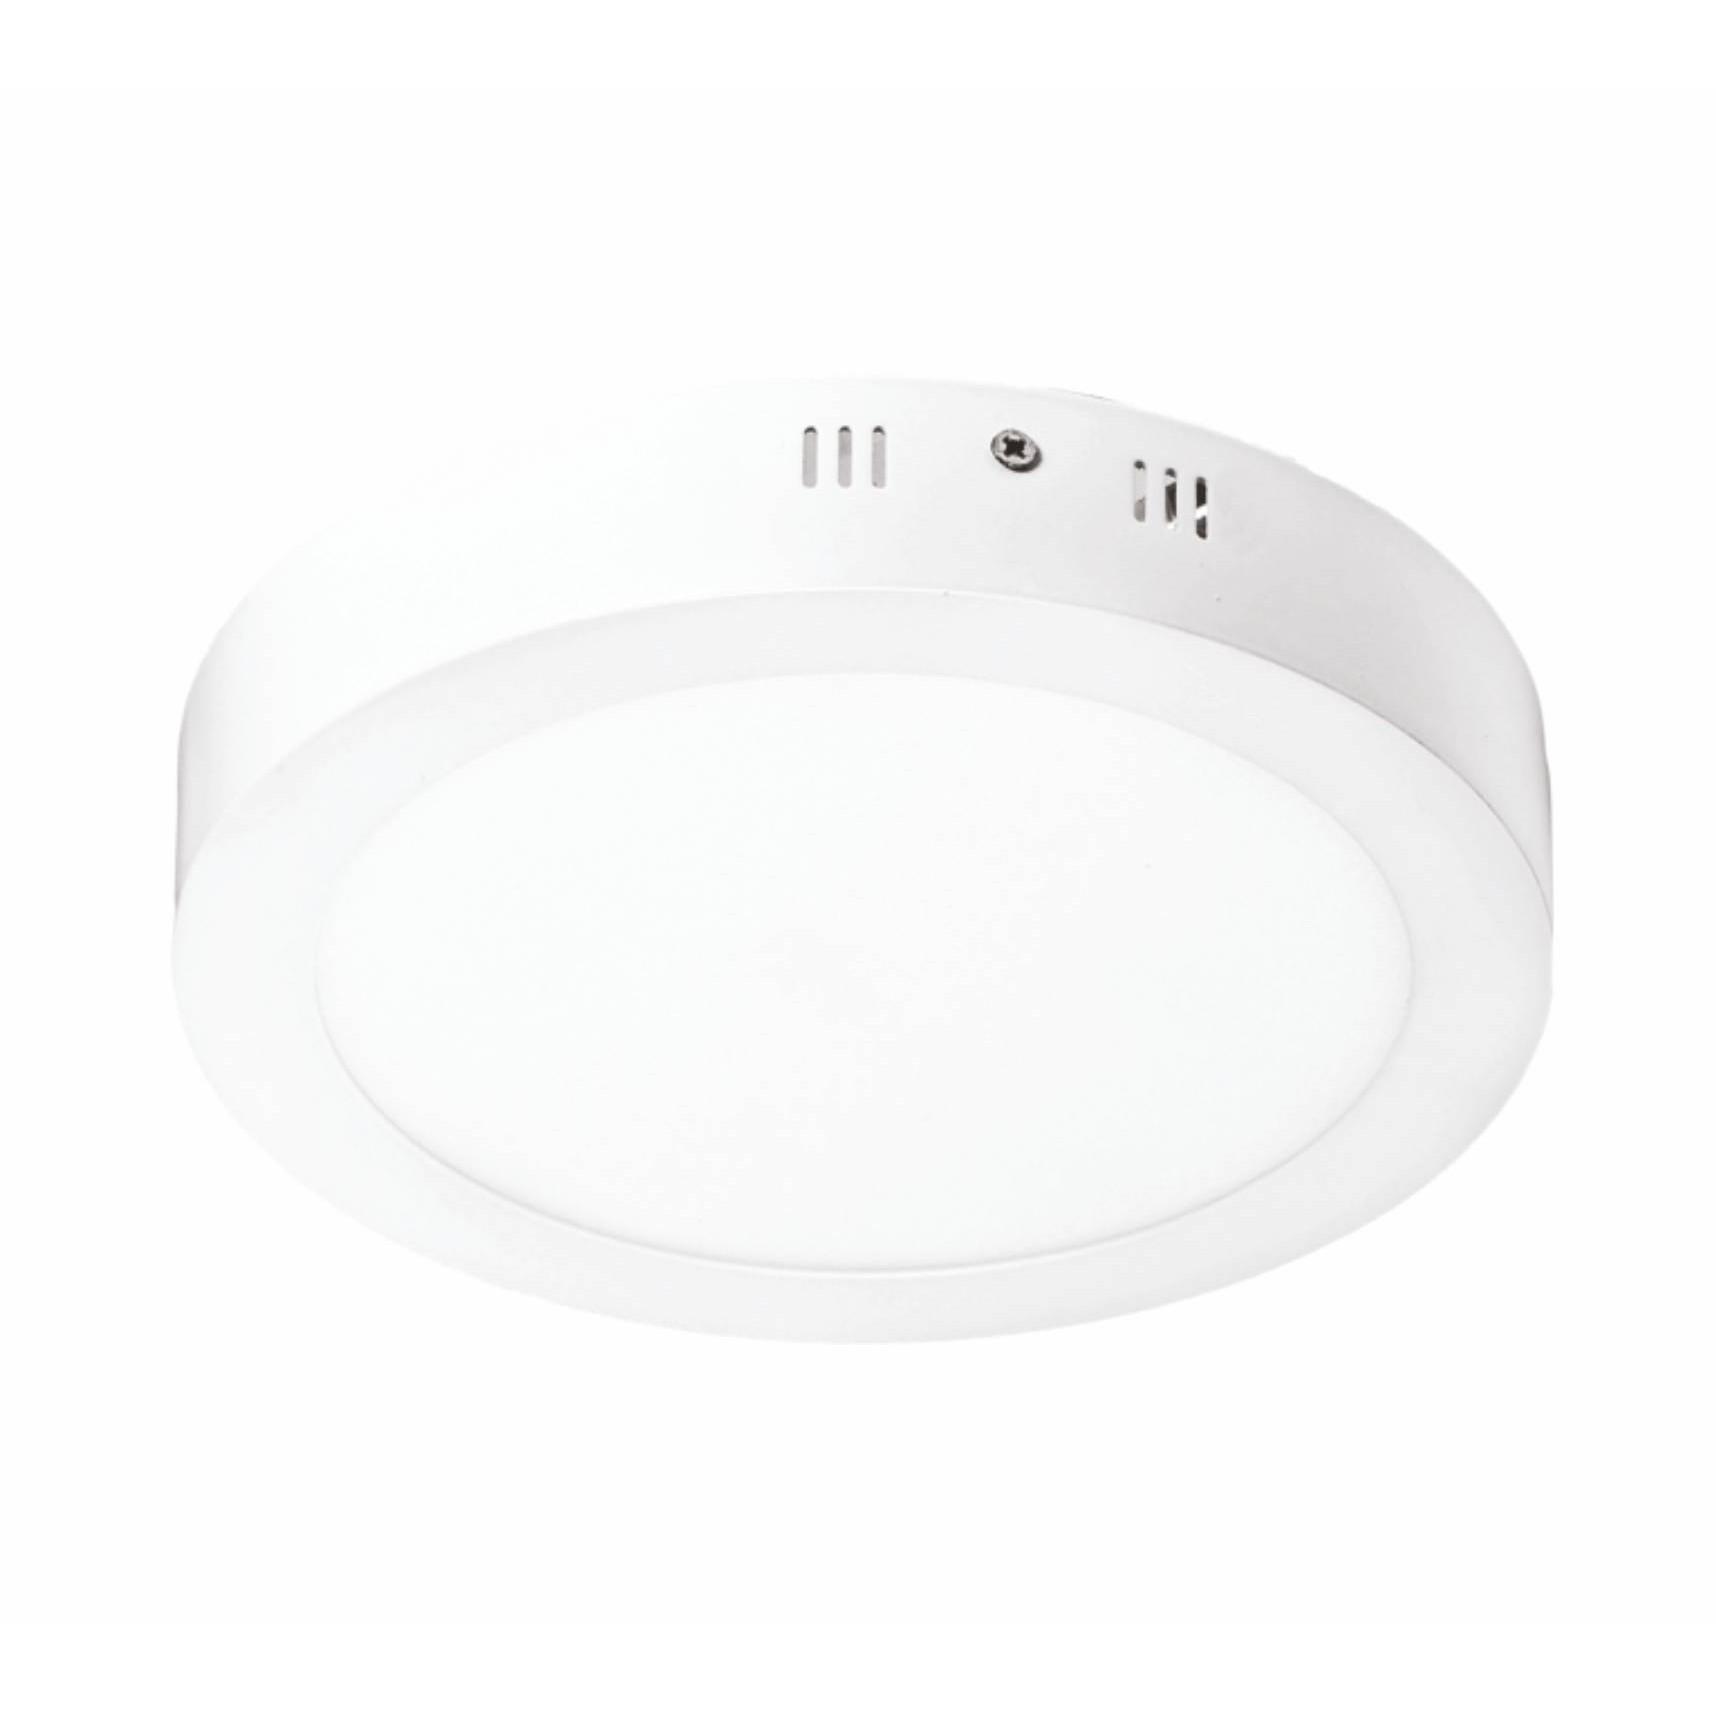 Painel Slim LED Sobrepor Redondo 18W Luz Branca - Glight